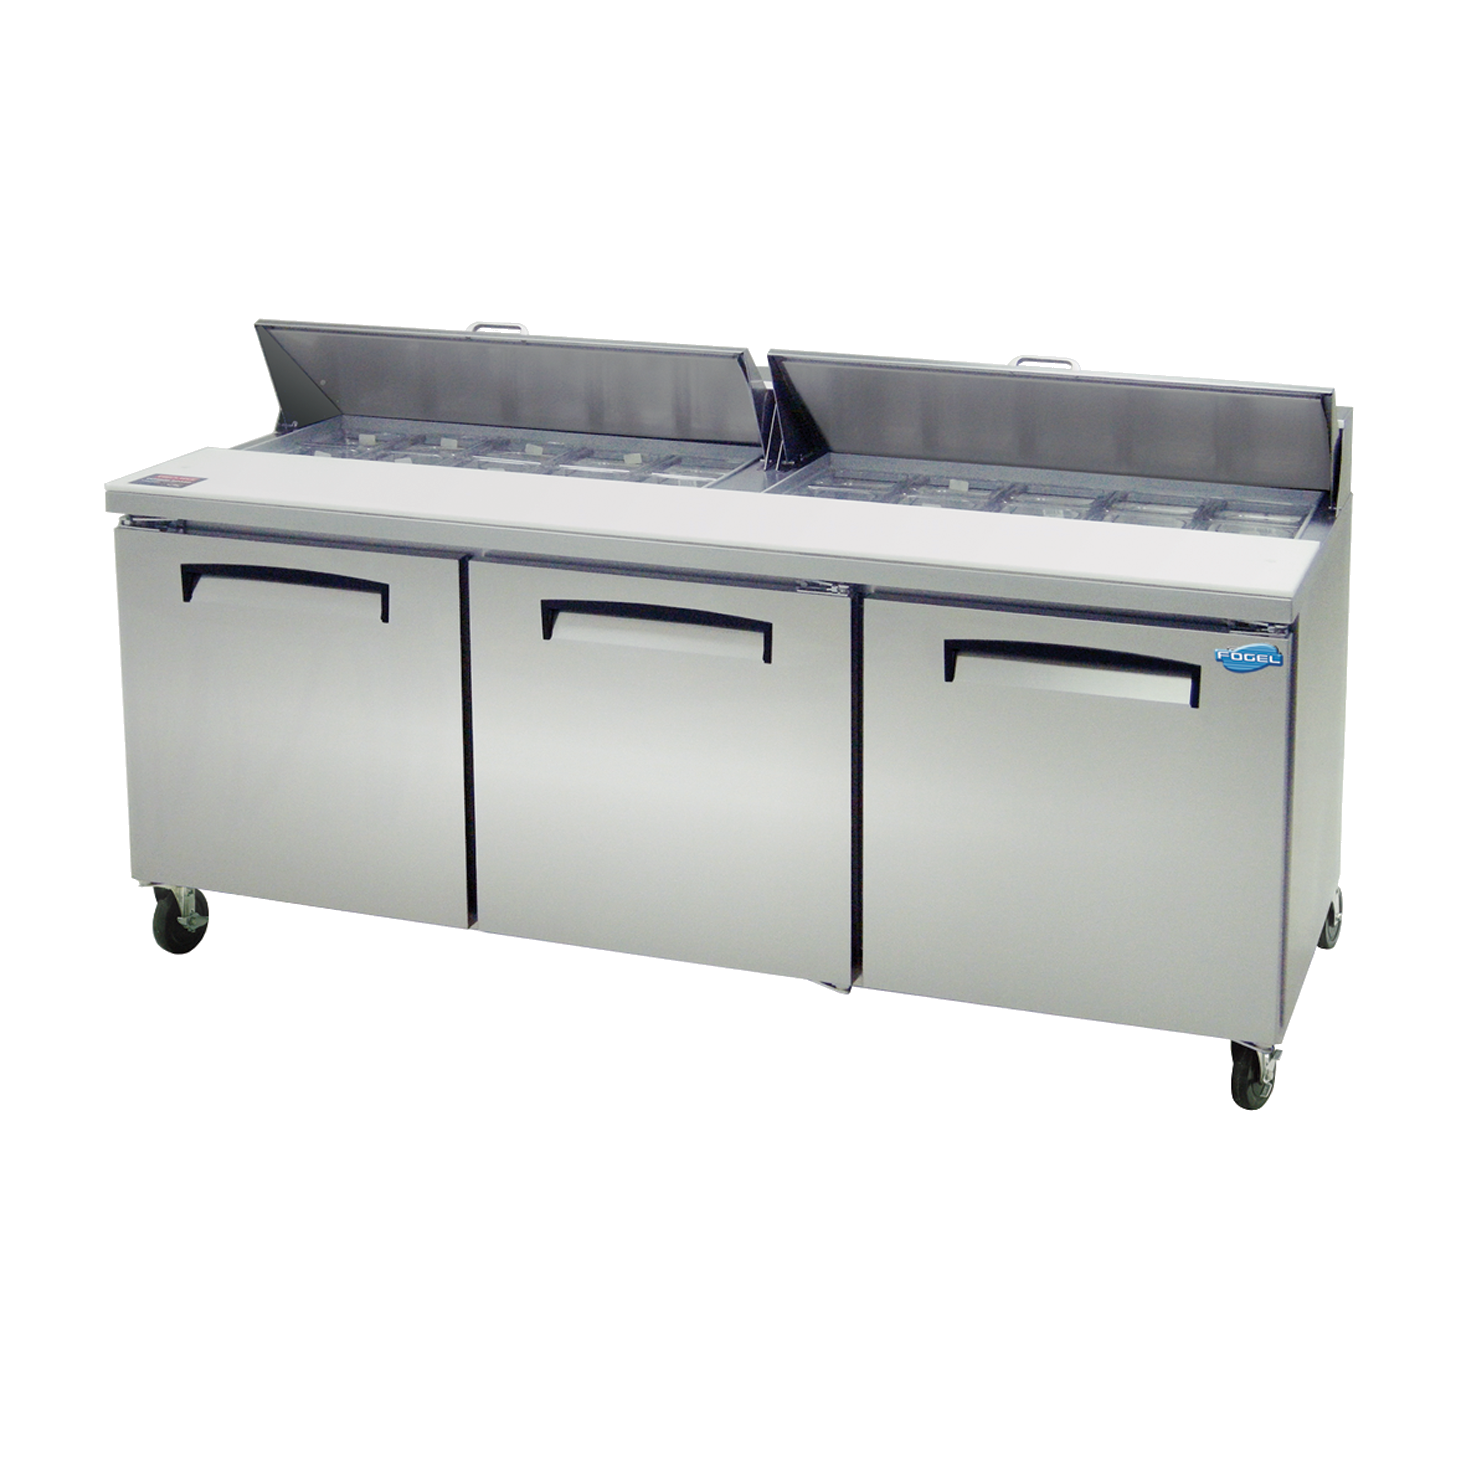 Fogel USA FLP-72-20 refrigerated counter, sandwich / salad unit